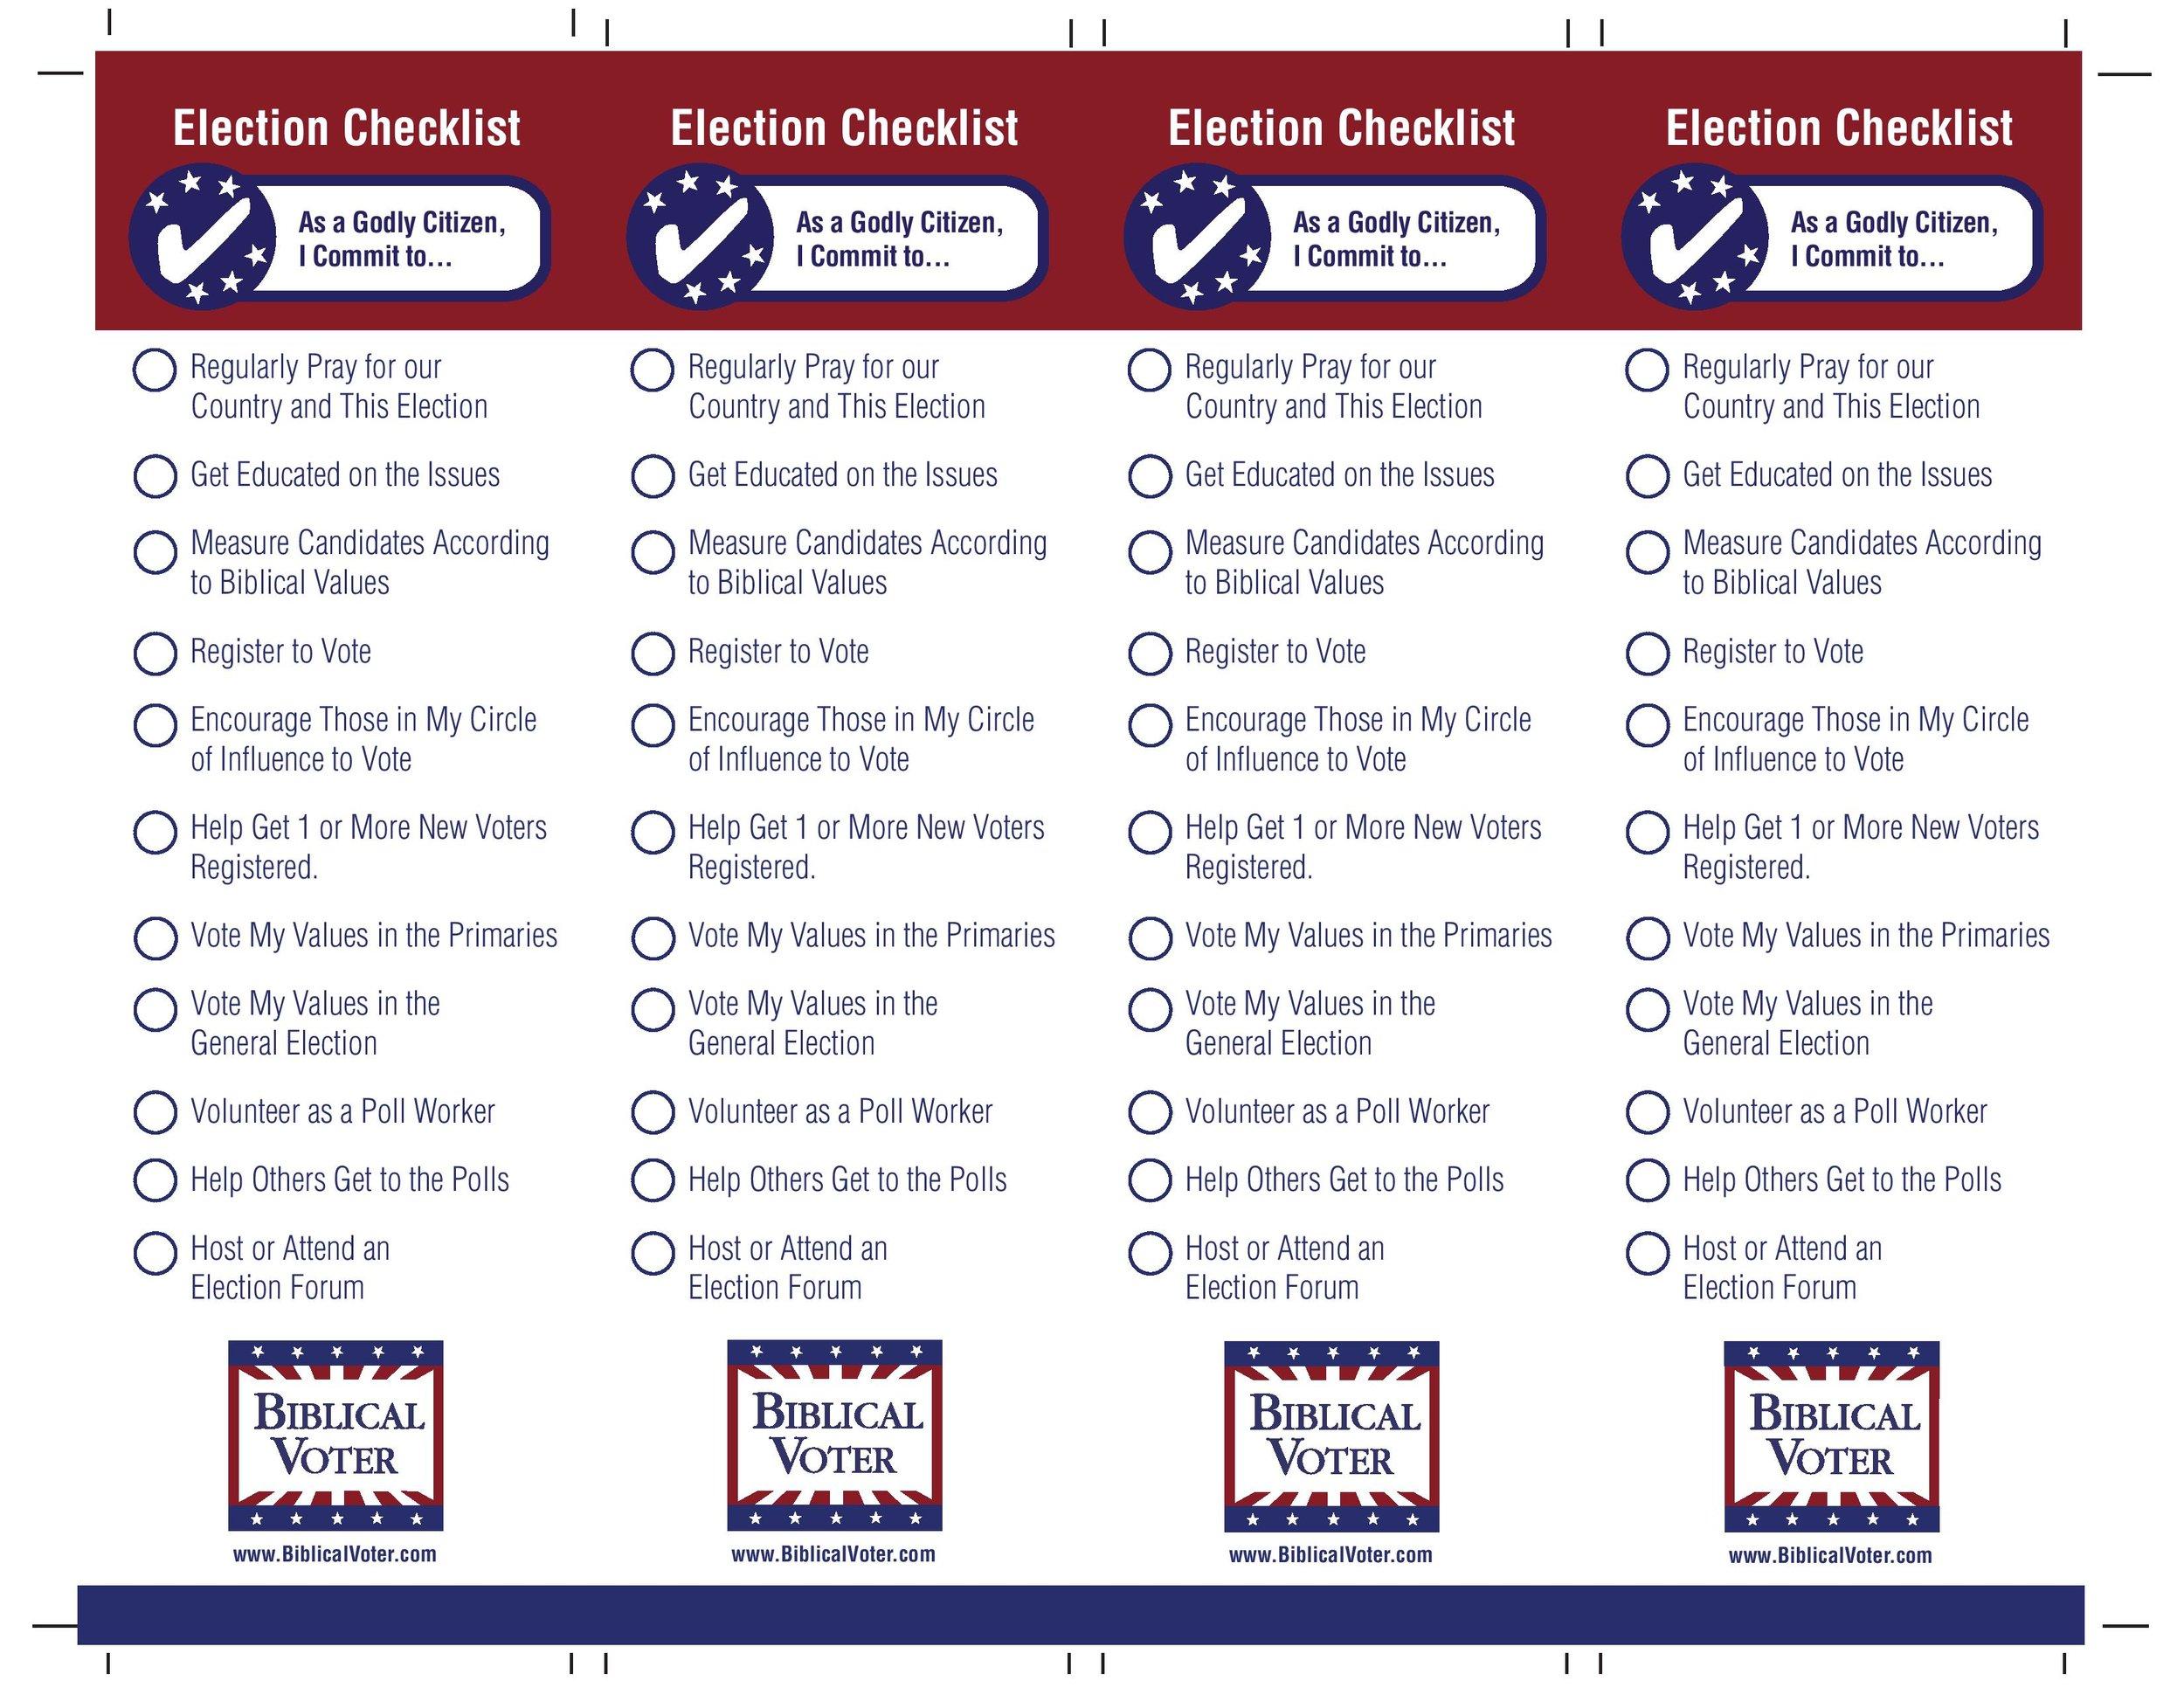 Biblical Voter Election Checklist 2019-page-001.jpg